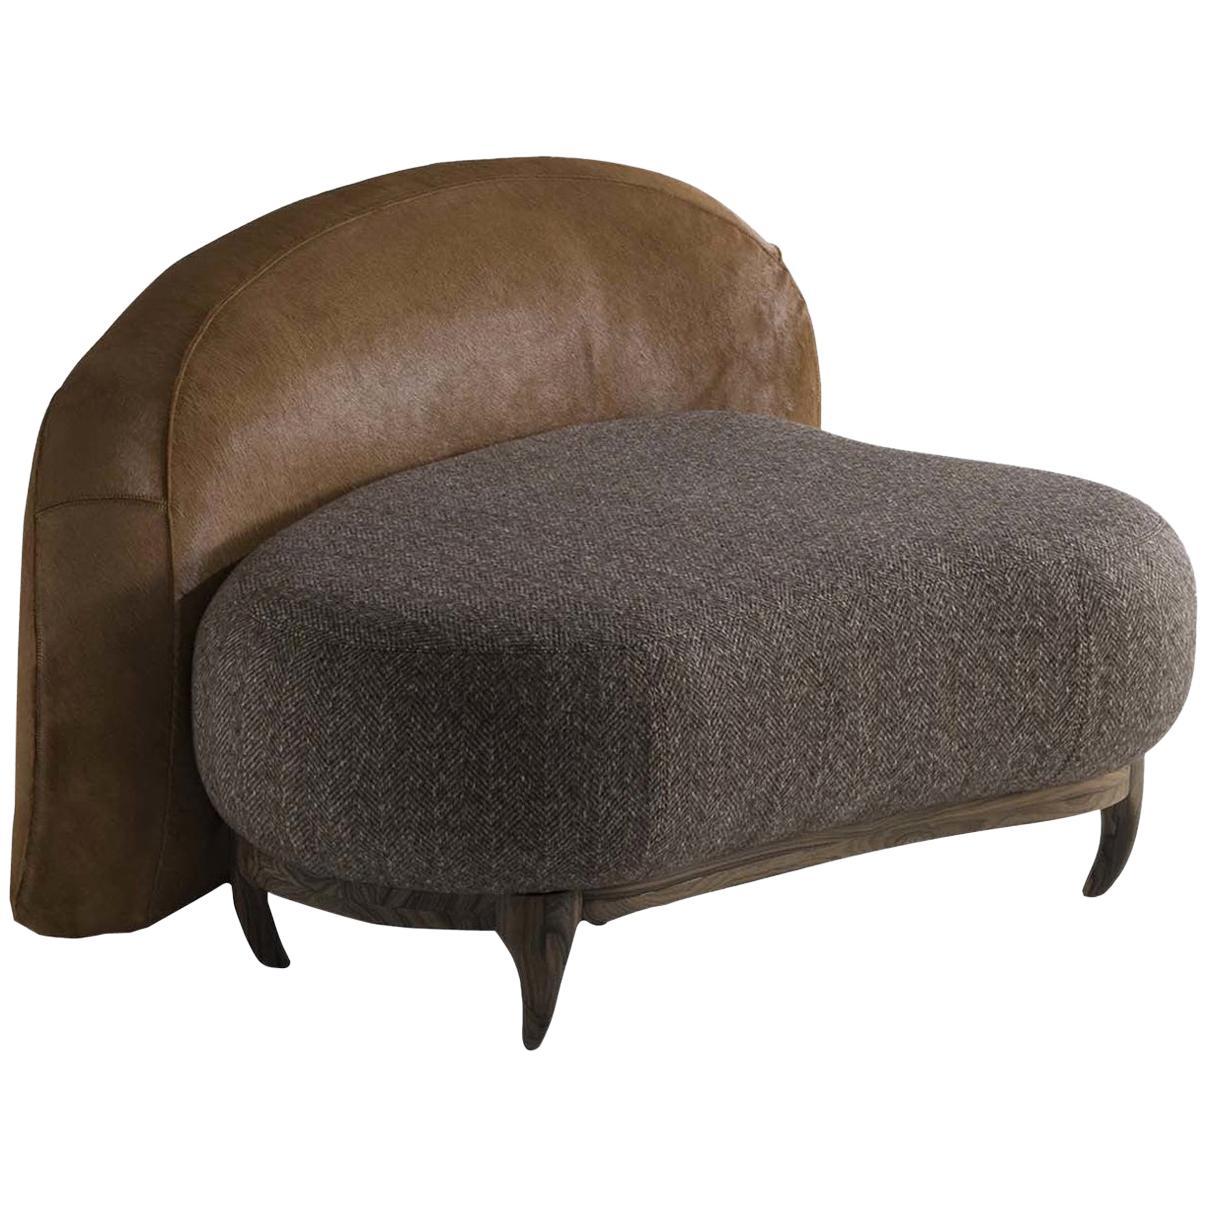 Animalia 2-Seat Sofa